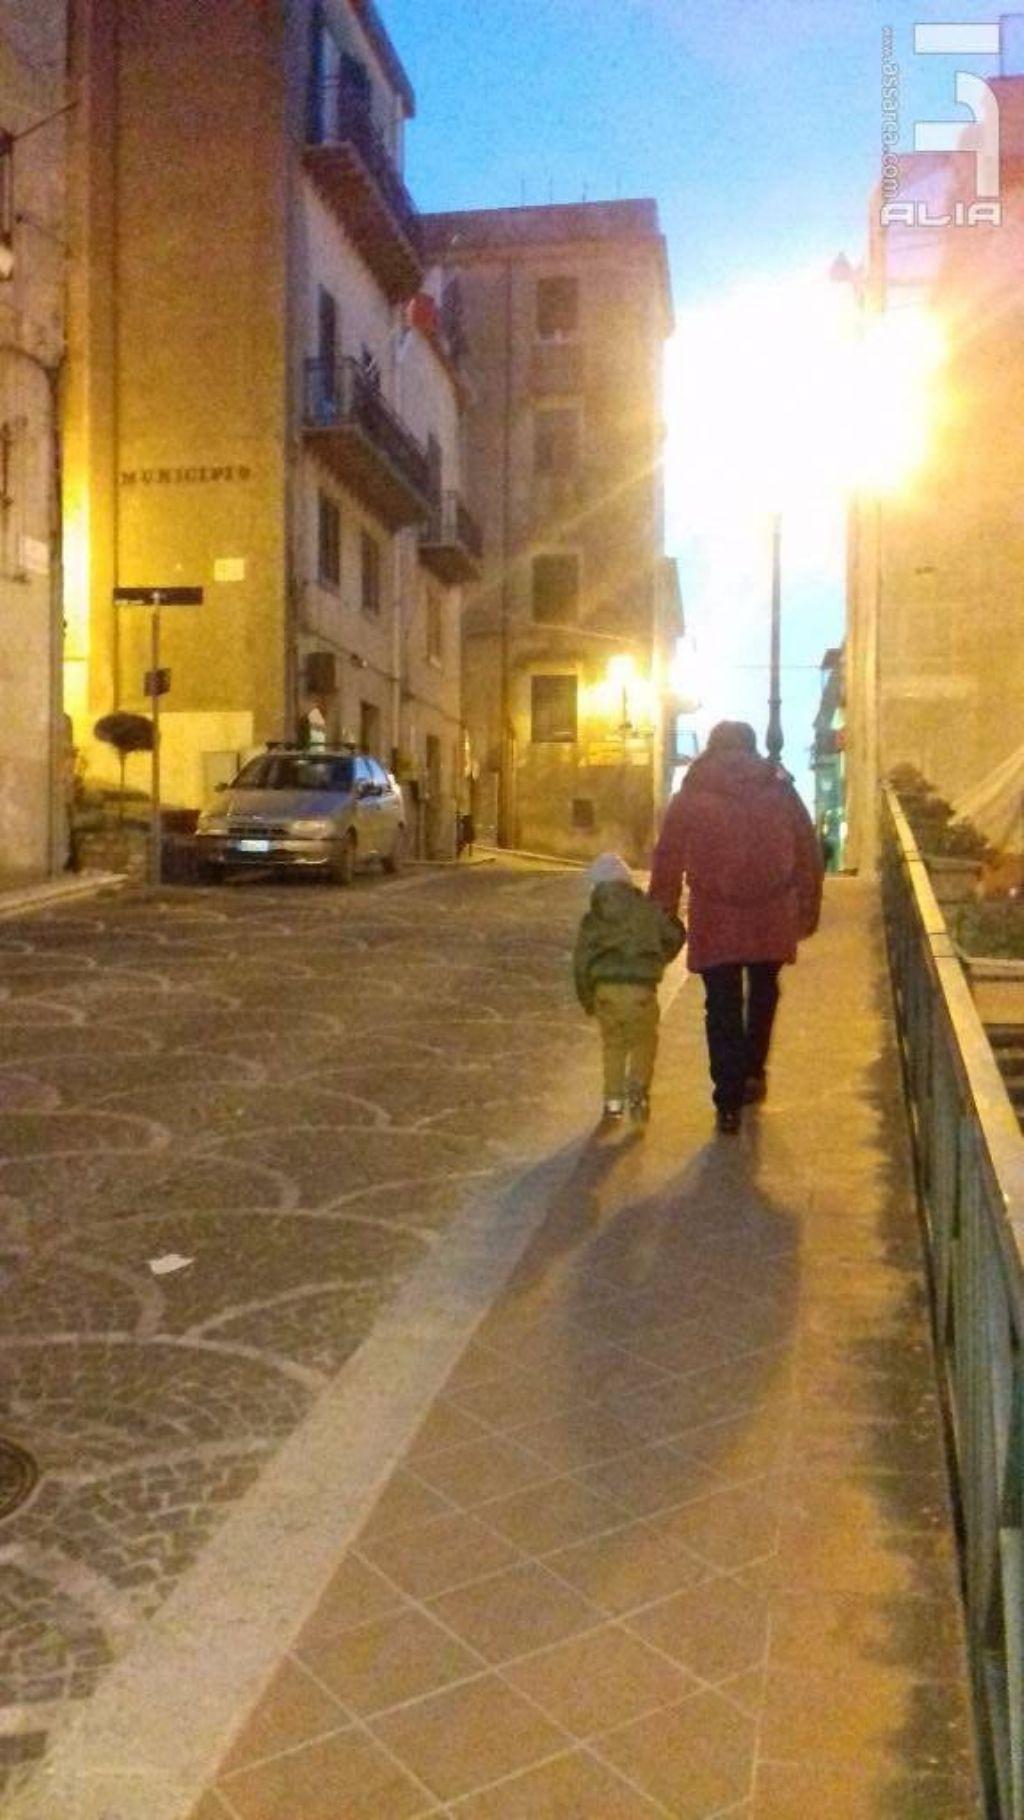 Alia Live via Vittorio Emanuele